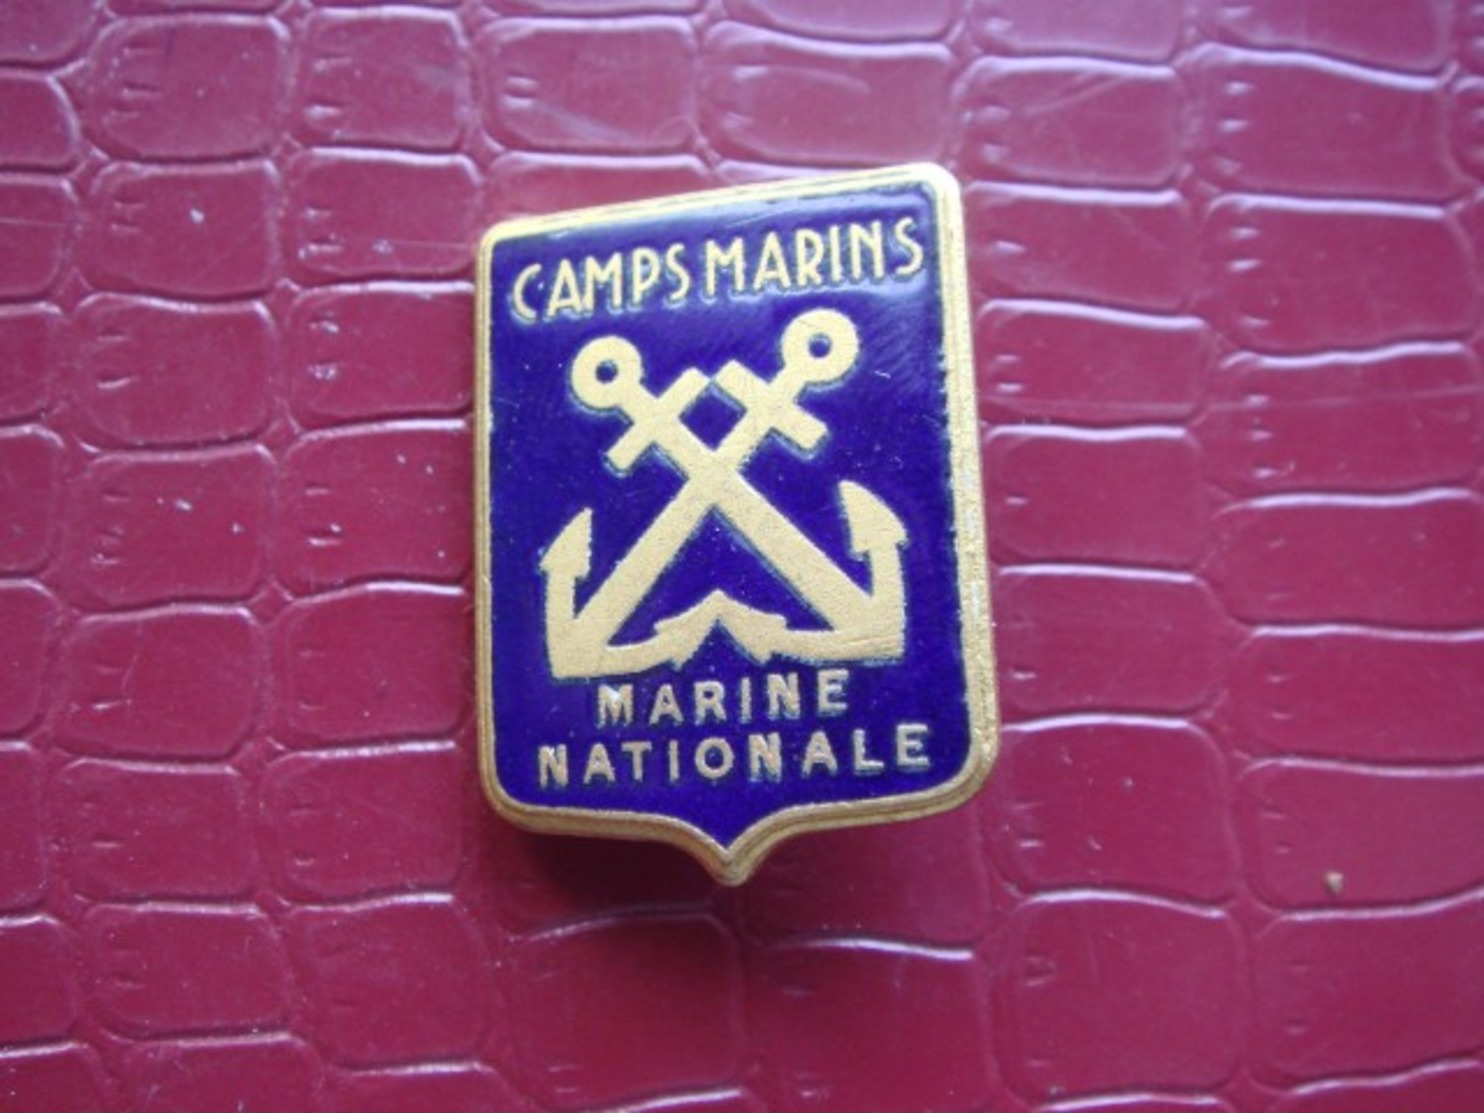 Marine Nationale . CAMPS MARINS - Marine